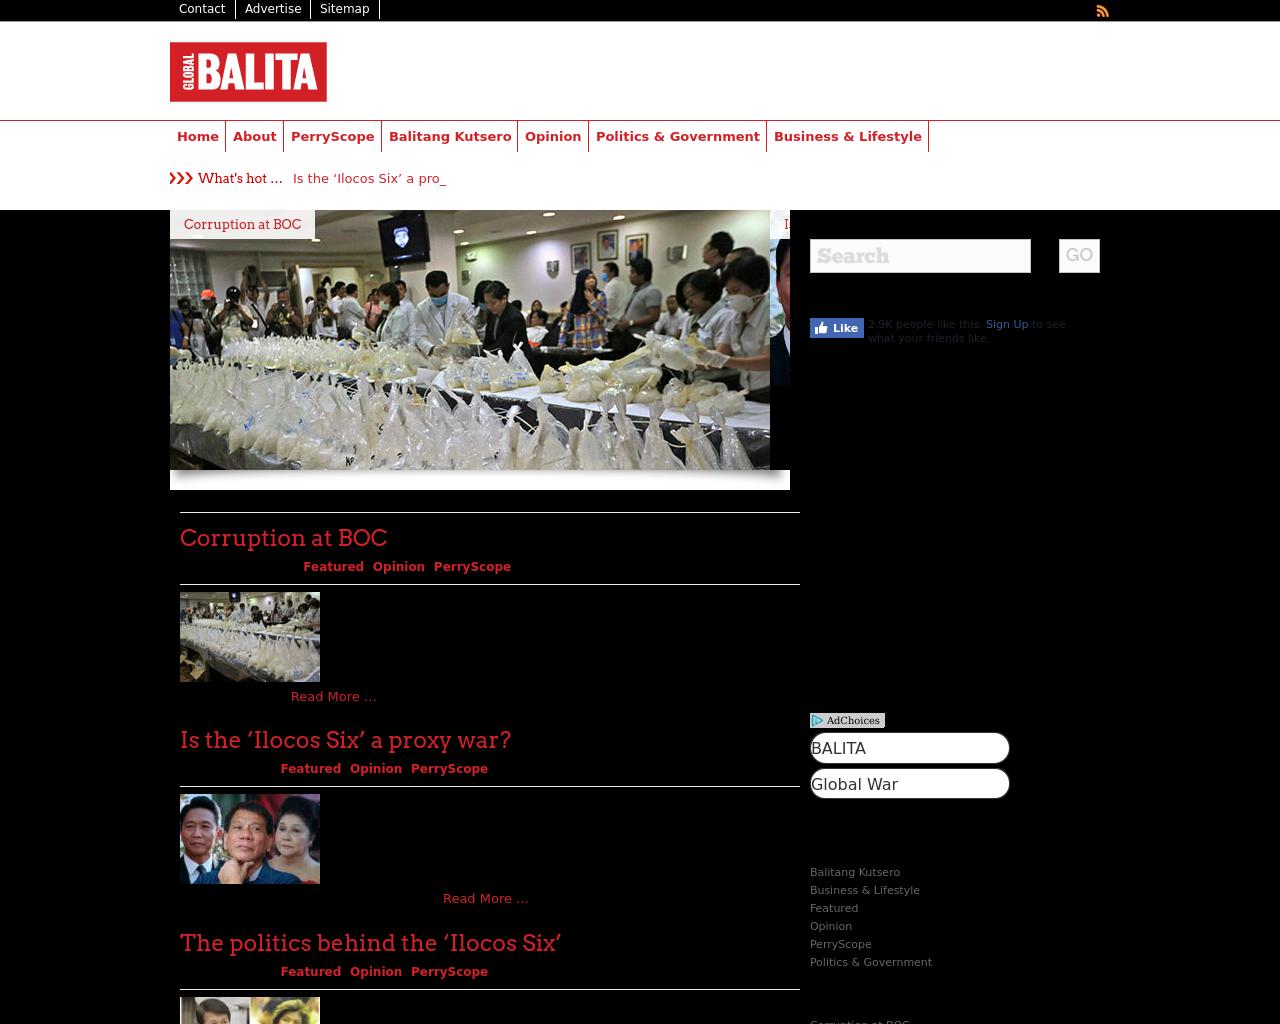 Global-Balita-Advertising-Reviews-Pricing